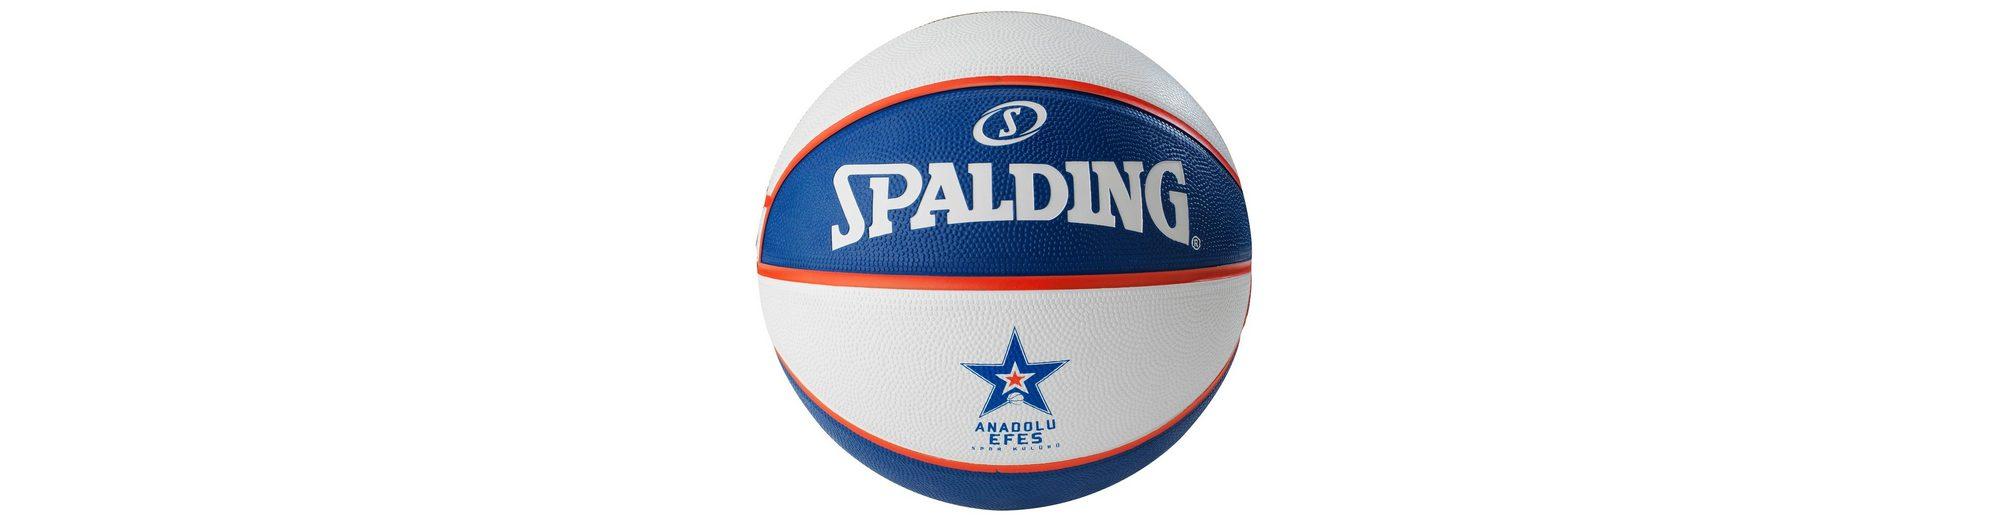 SPALDING EL Team Anadolu Efes Istanbul Basketball